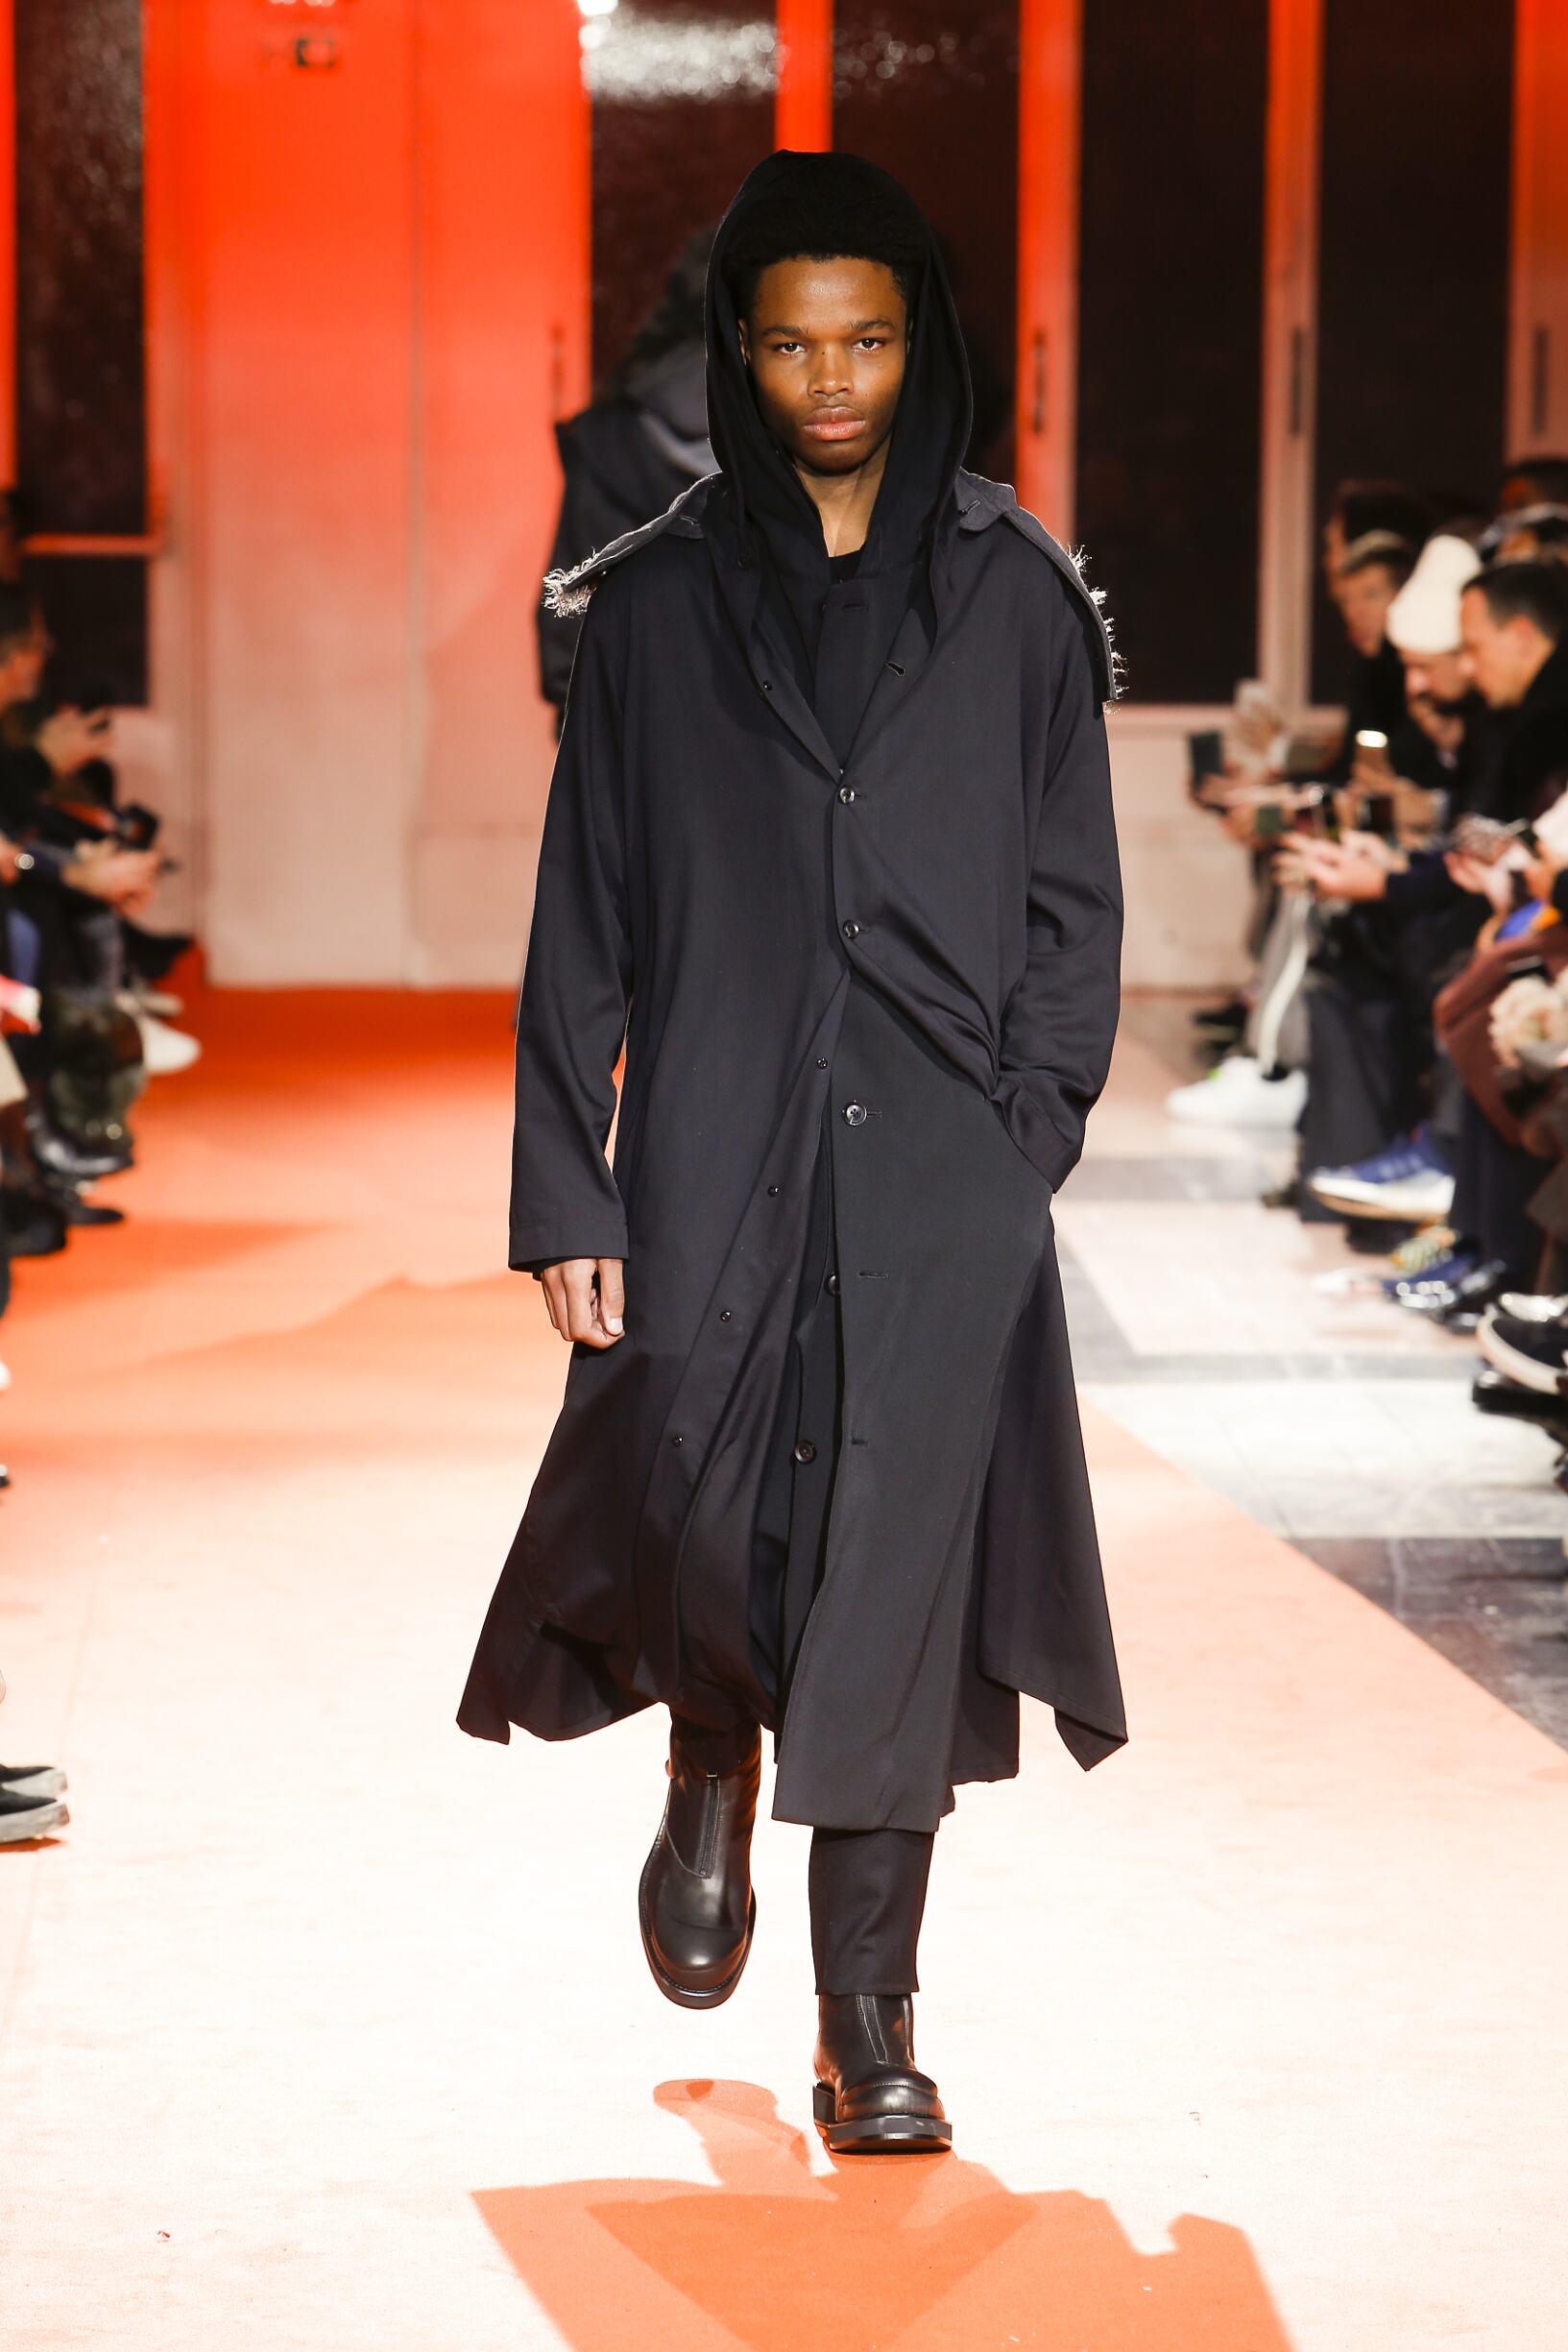 Man FW 2018-19 Fashion Show Yohji Yamamoto